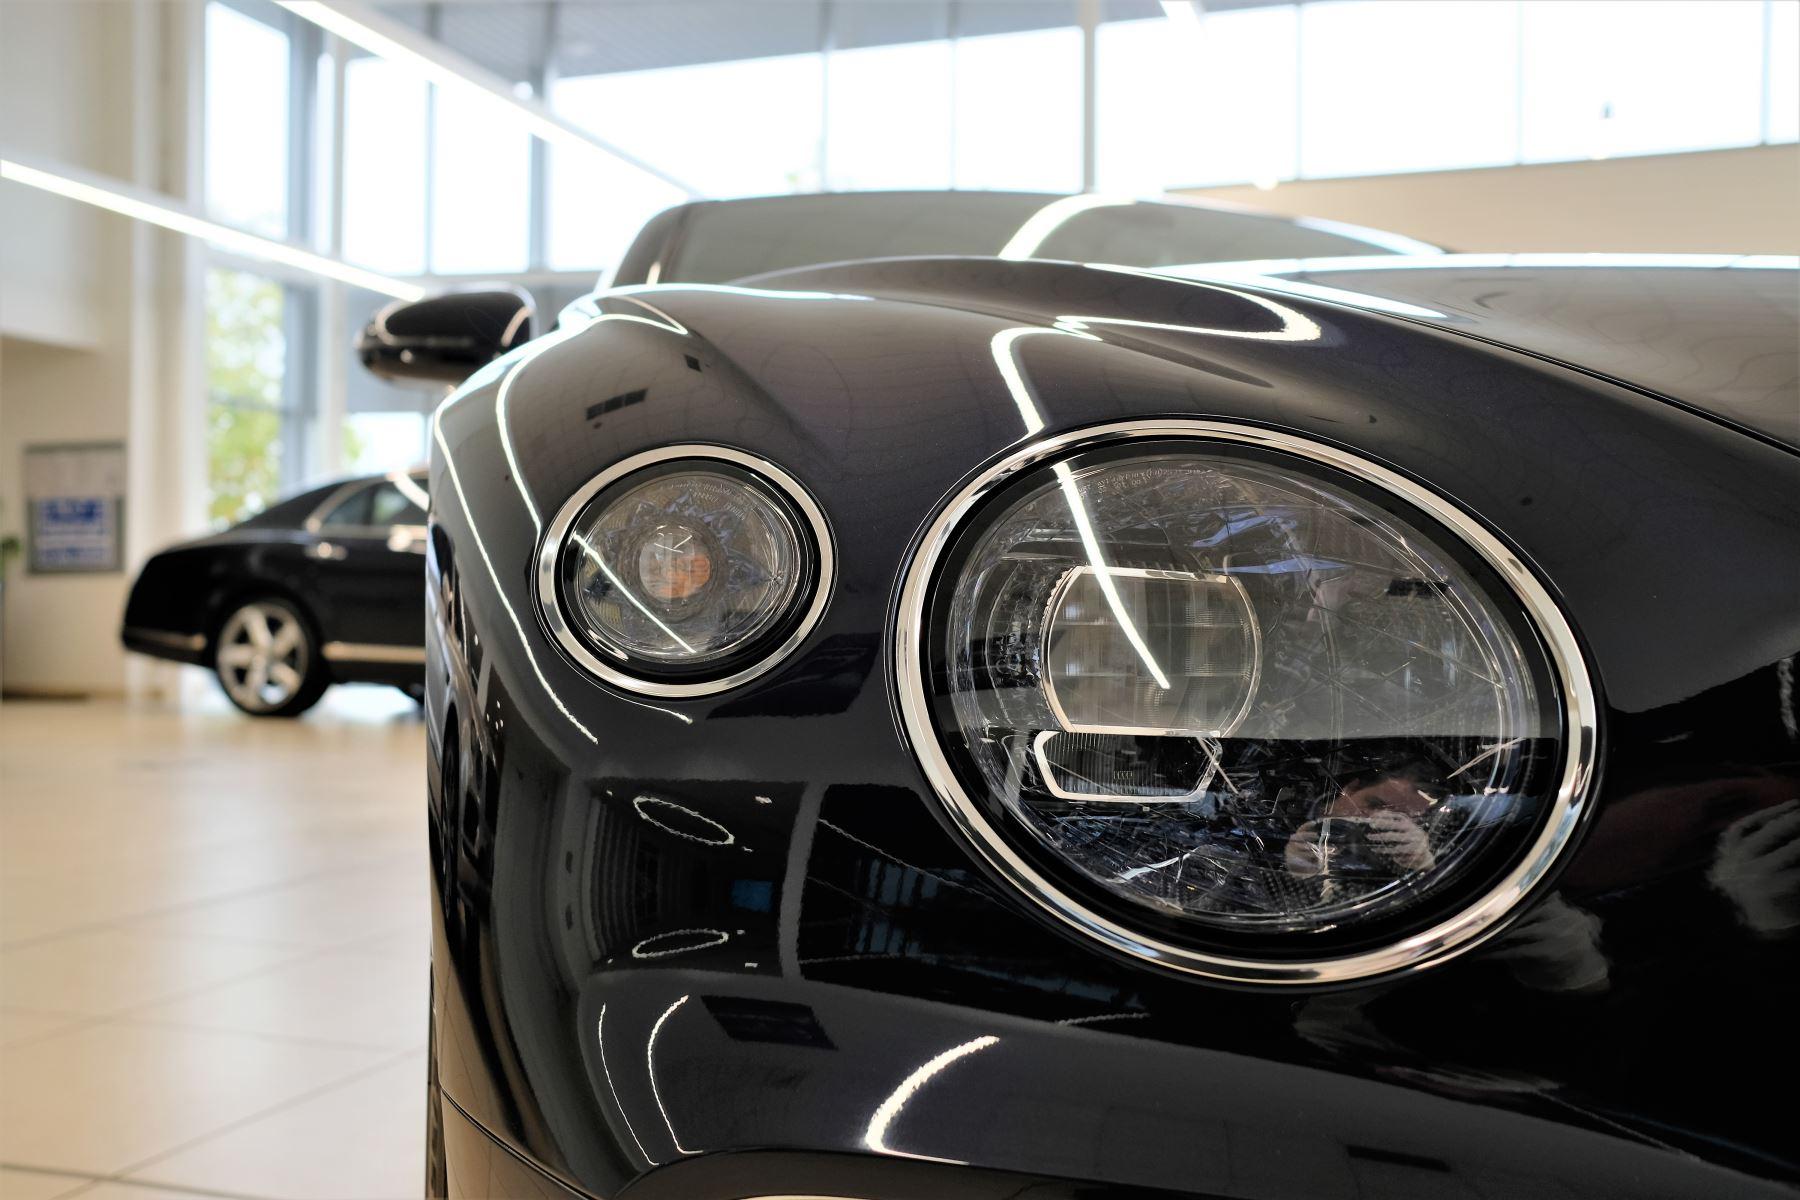 Bentley Continental GT 4.0 V8 Mulliner Edition Auto [Tour Spec] image 6